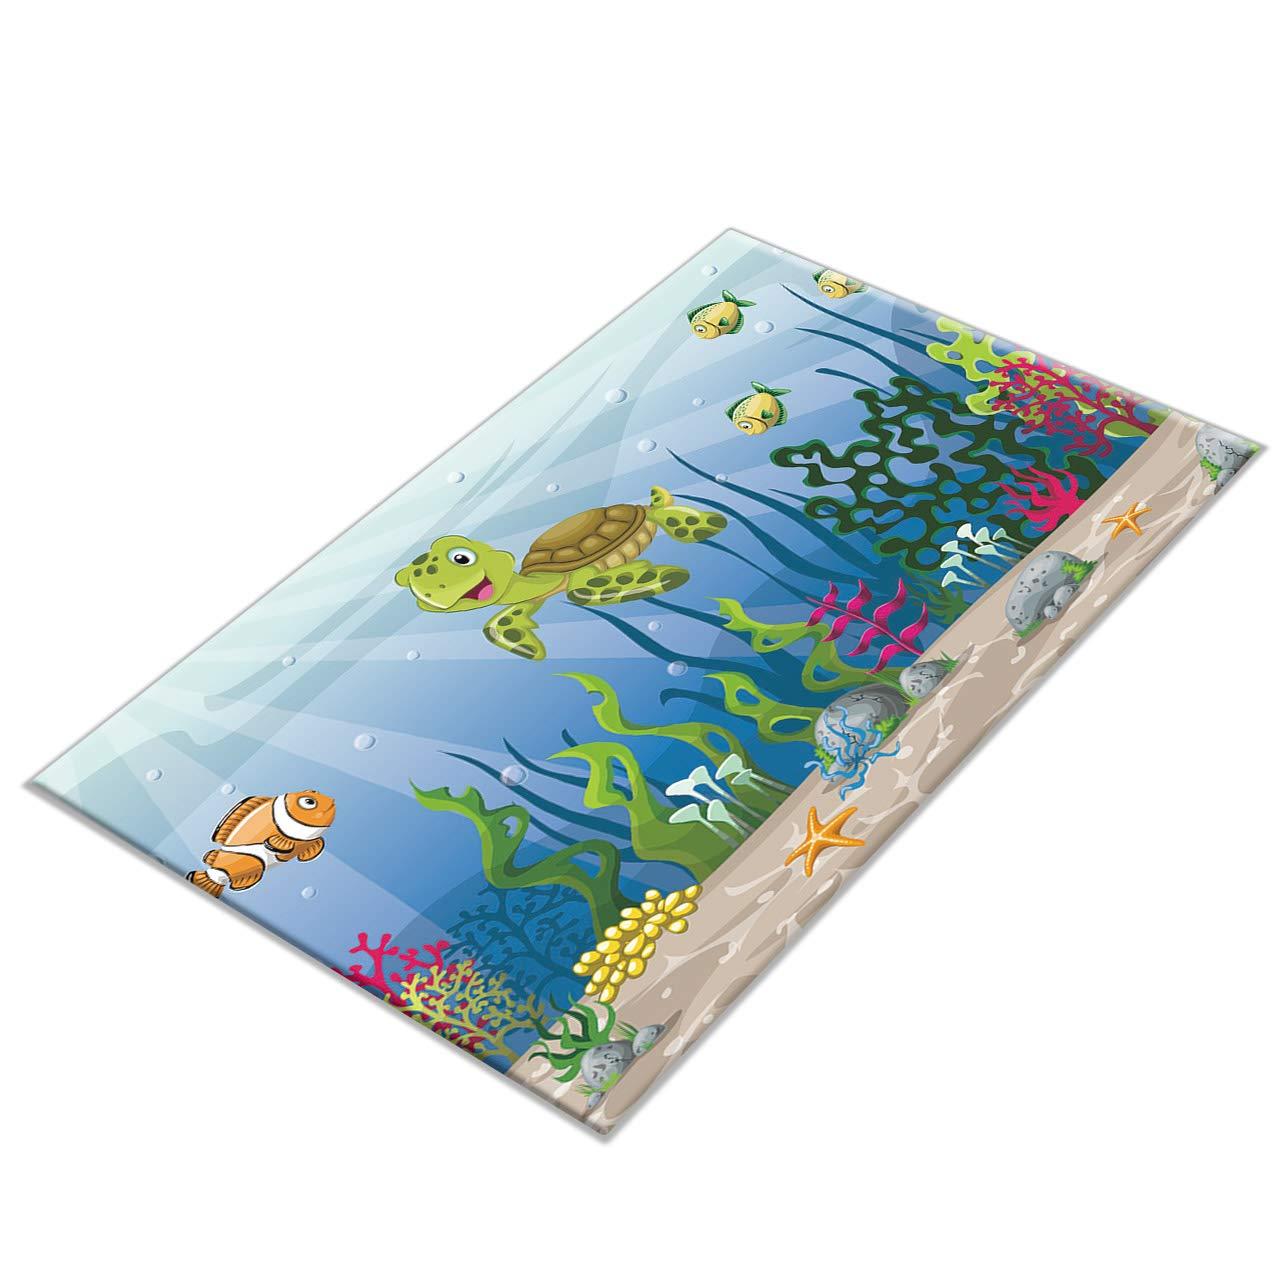 14x2 HVEST Green Palm Leaves Area Rugs Tropical Forest Carpet Non-Slip Doormat for Living Room Bedroom Kitchen Floor Mat,